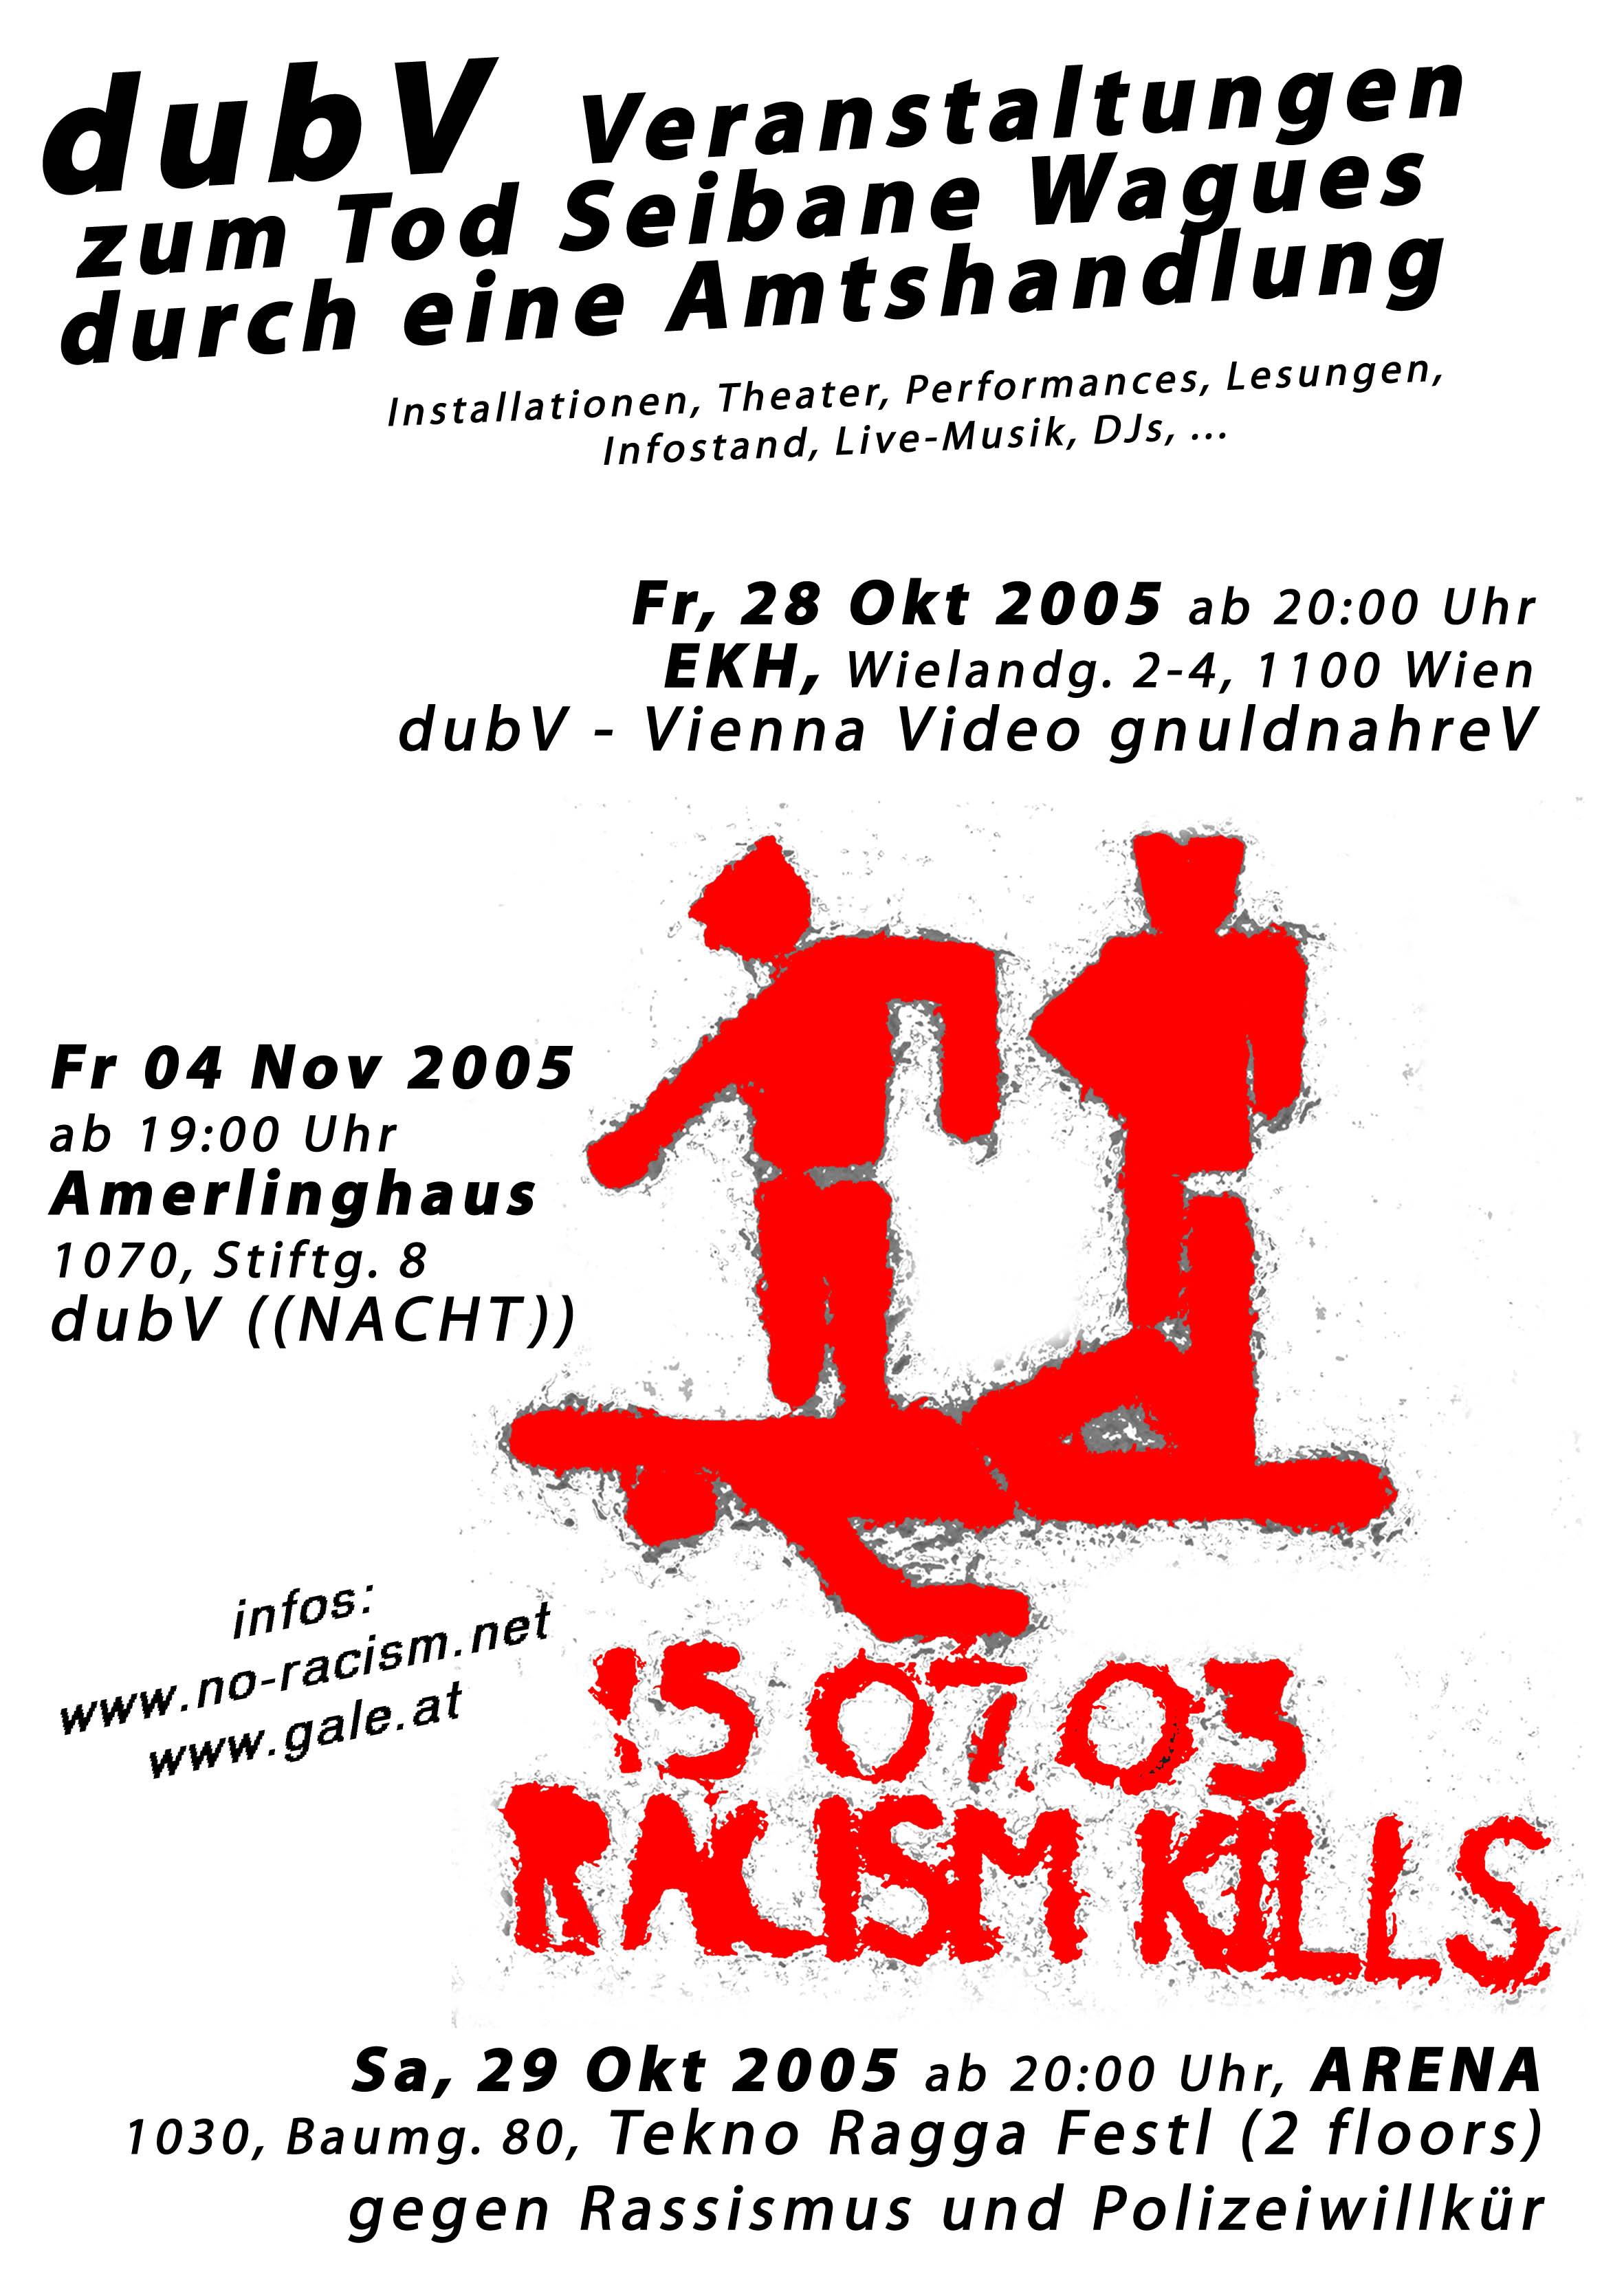 no-racism.net: dubV - Veranstaltung zum Tod Seibane Wagues durch ...